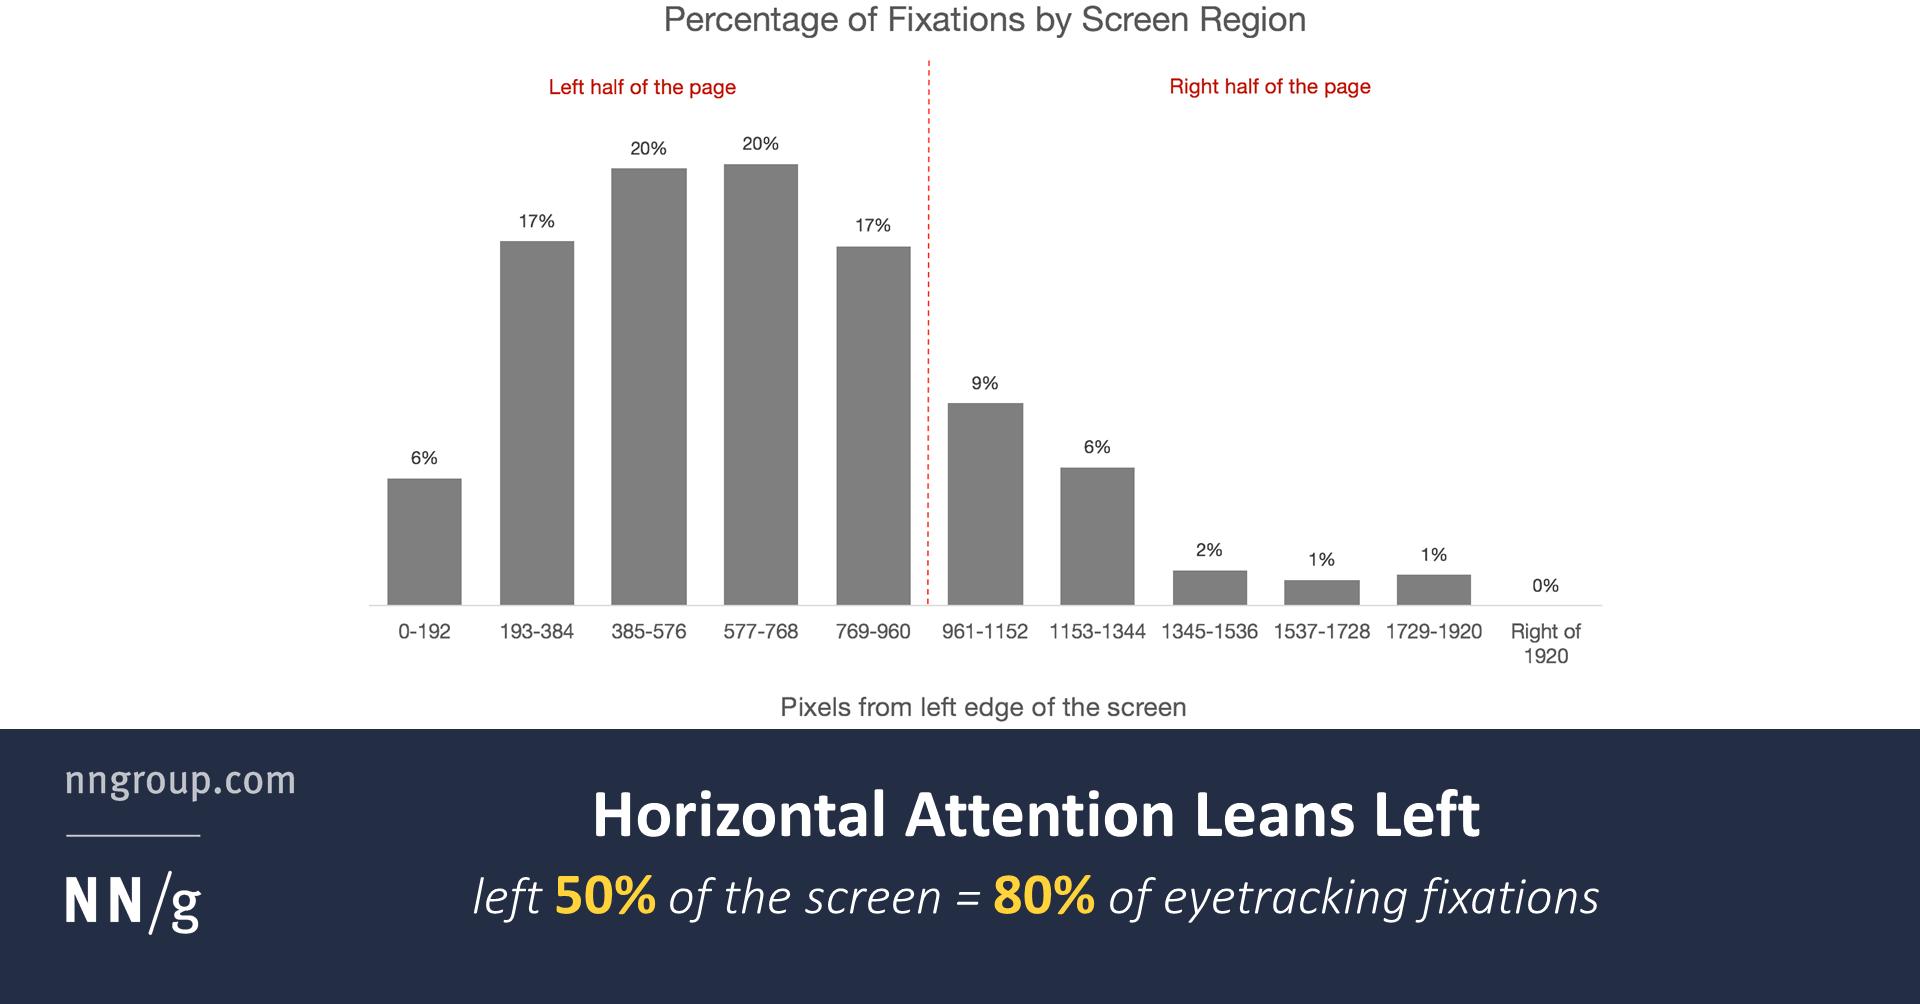 Horizontal Attention Leans Left